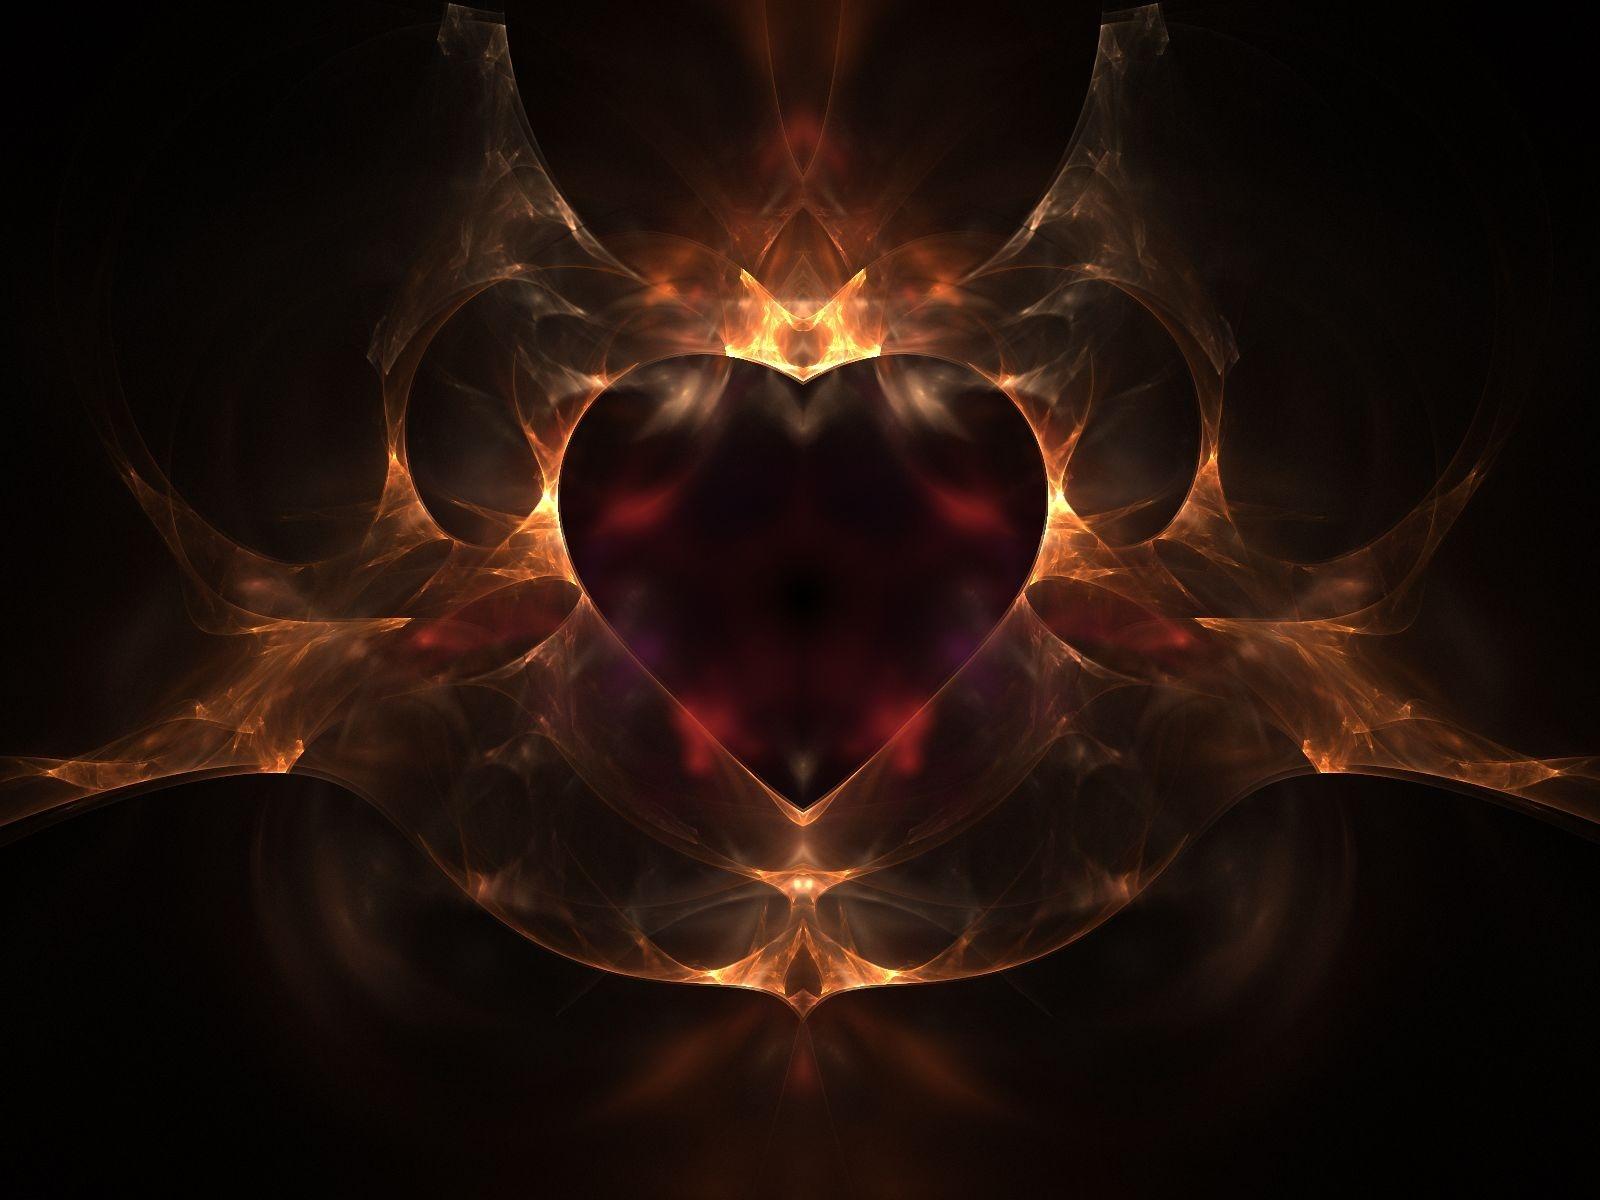 fire heart wallpaper - sf wallpaper